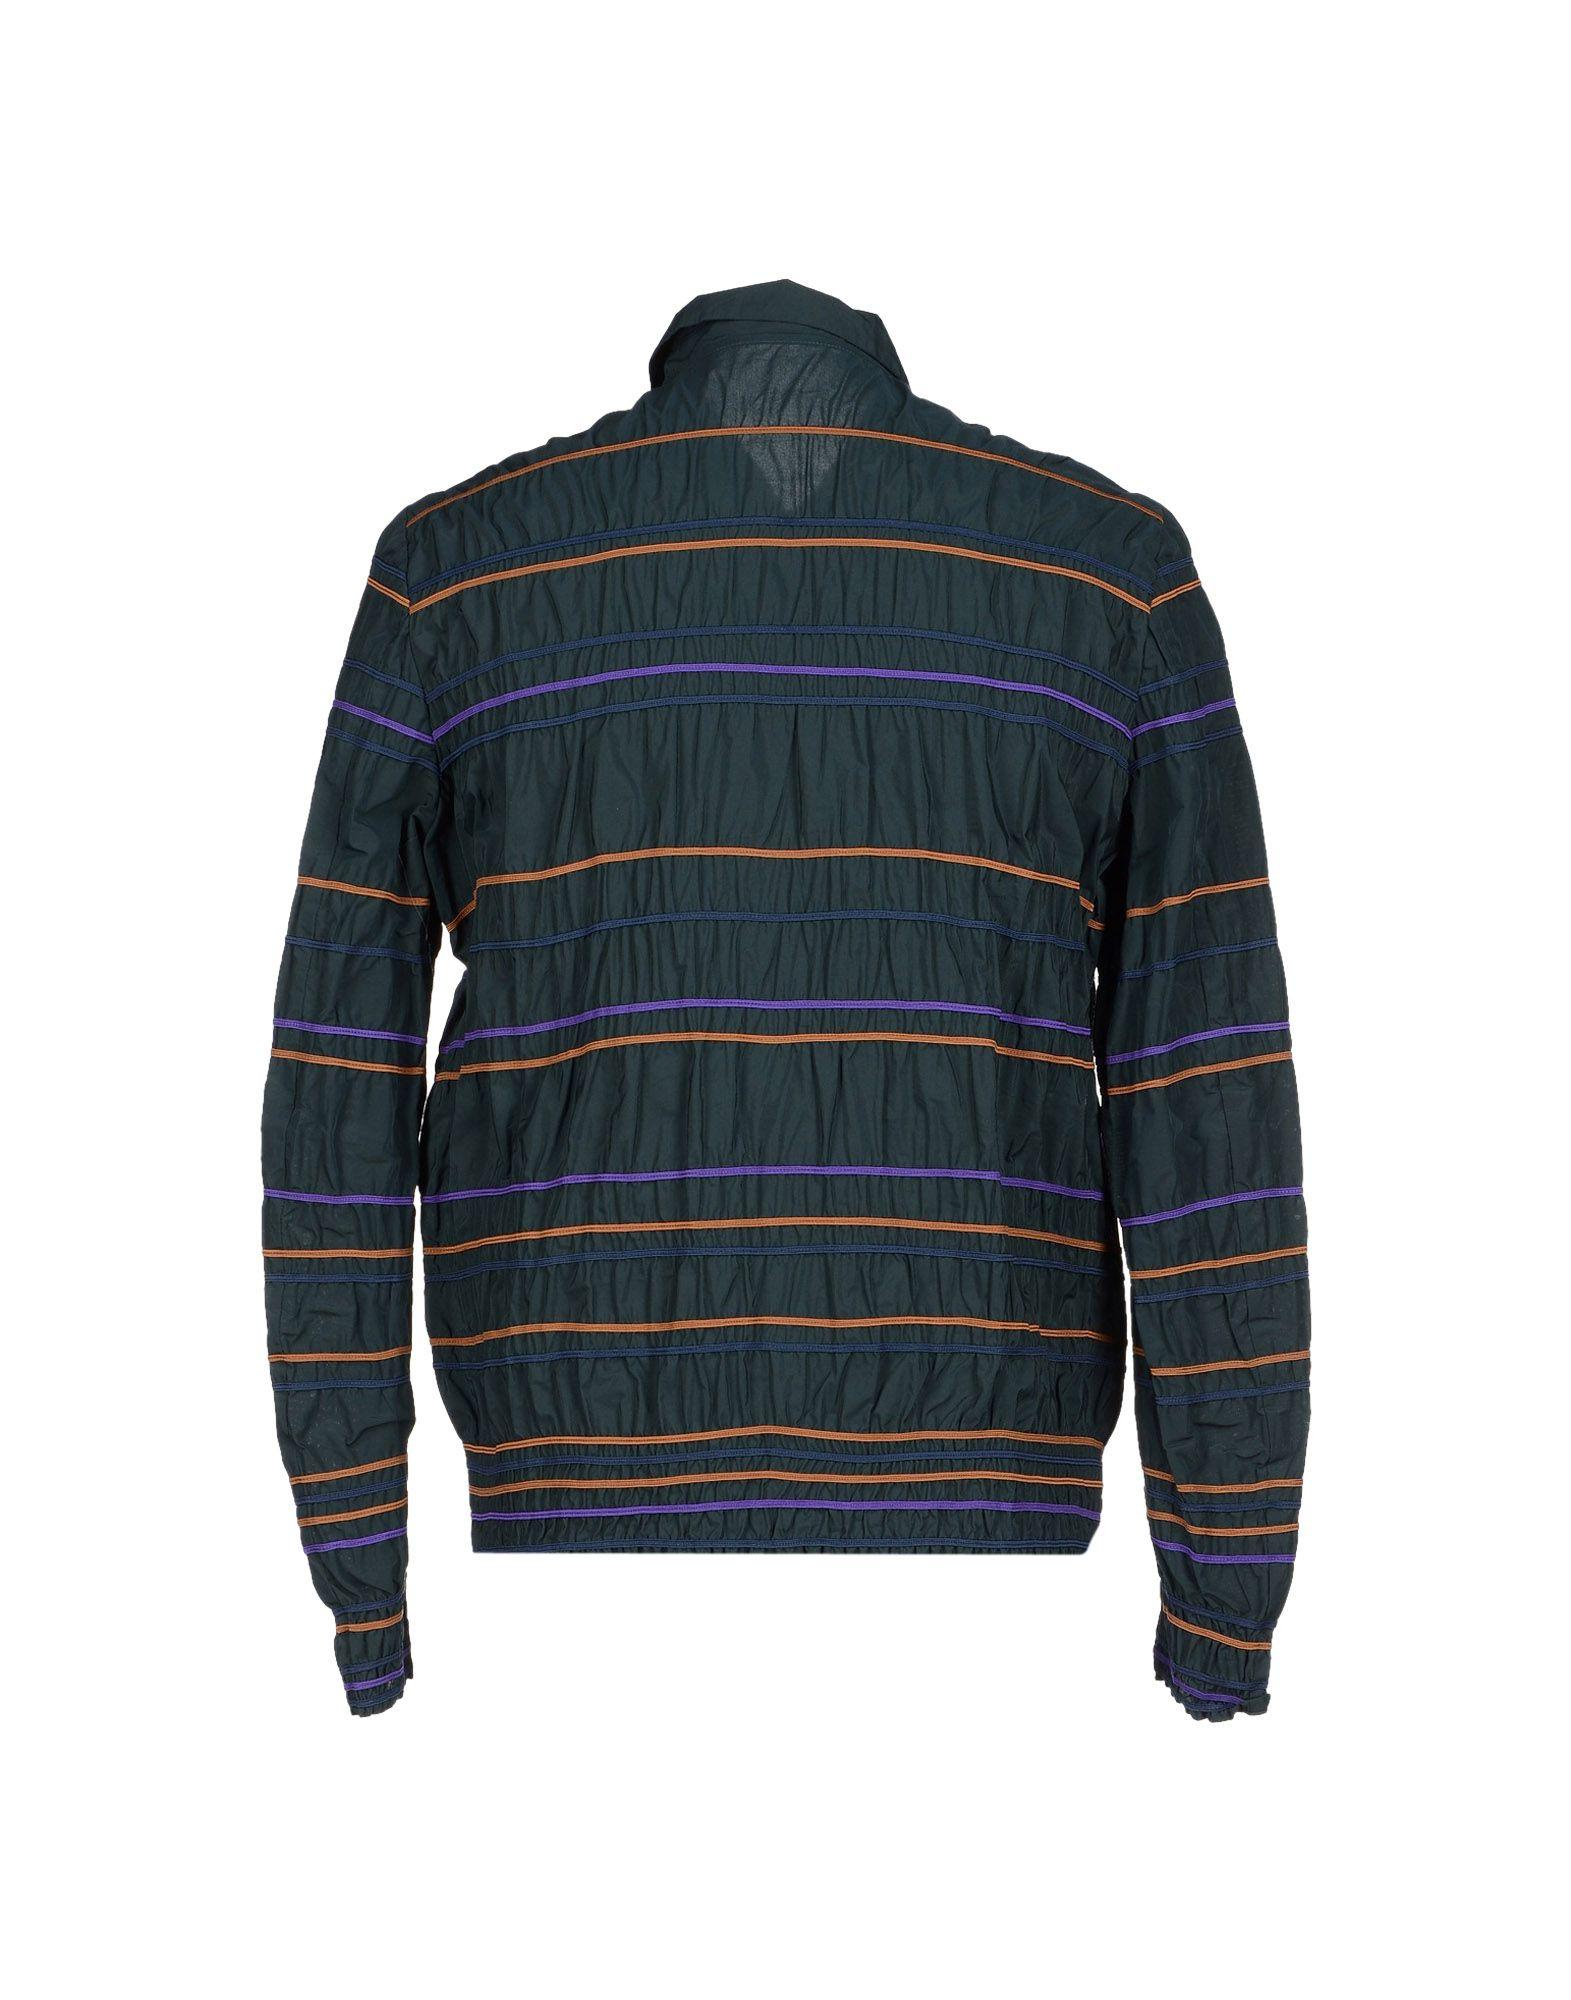 Kolor Synthetic Jacket in Deep Jade (Blue) for Men